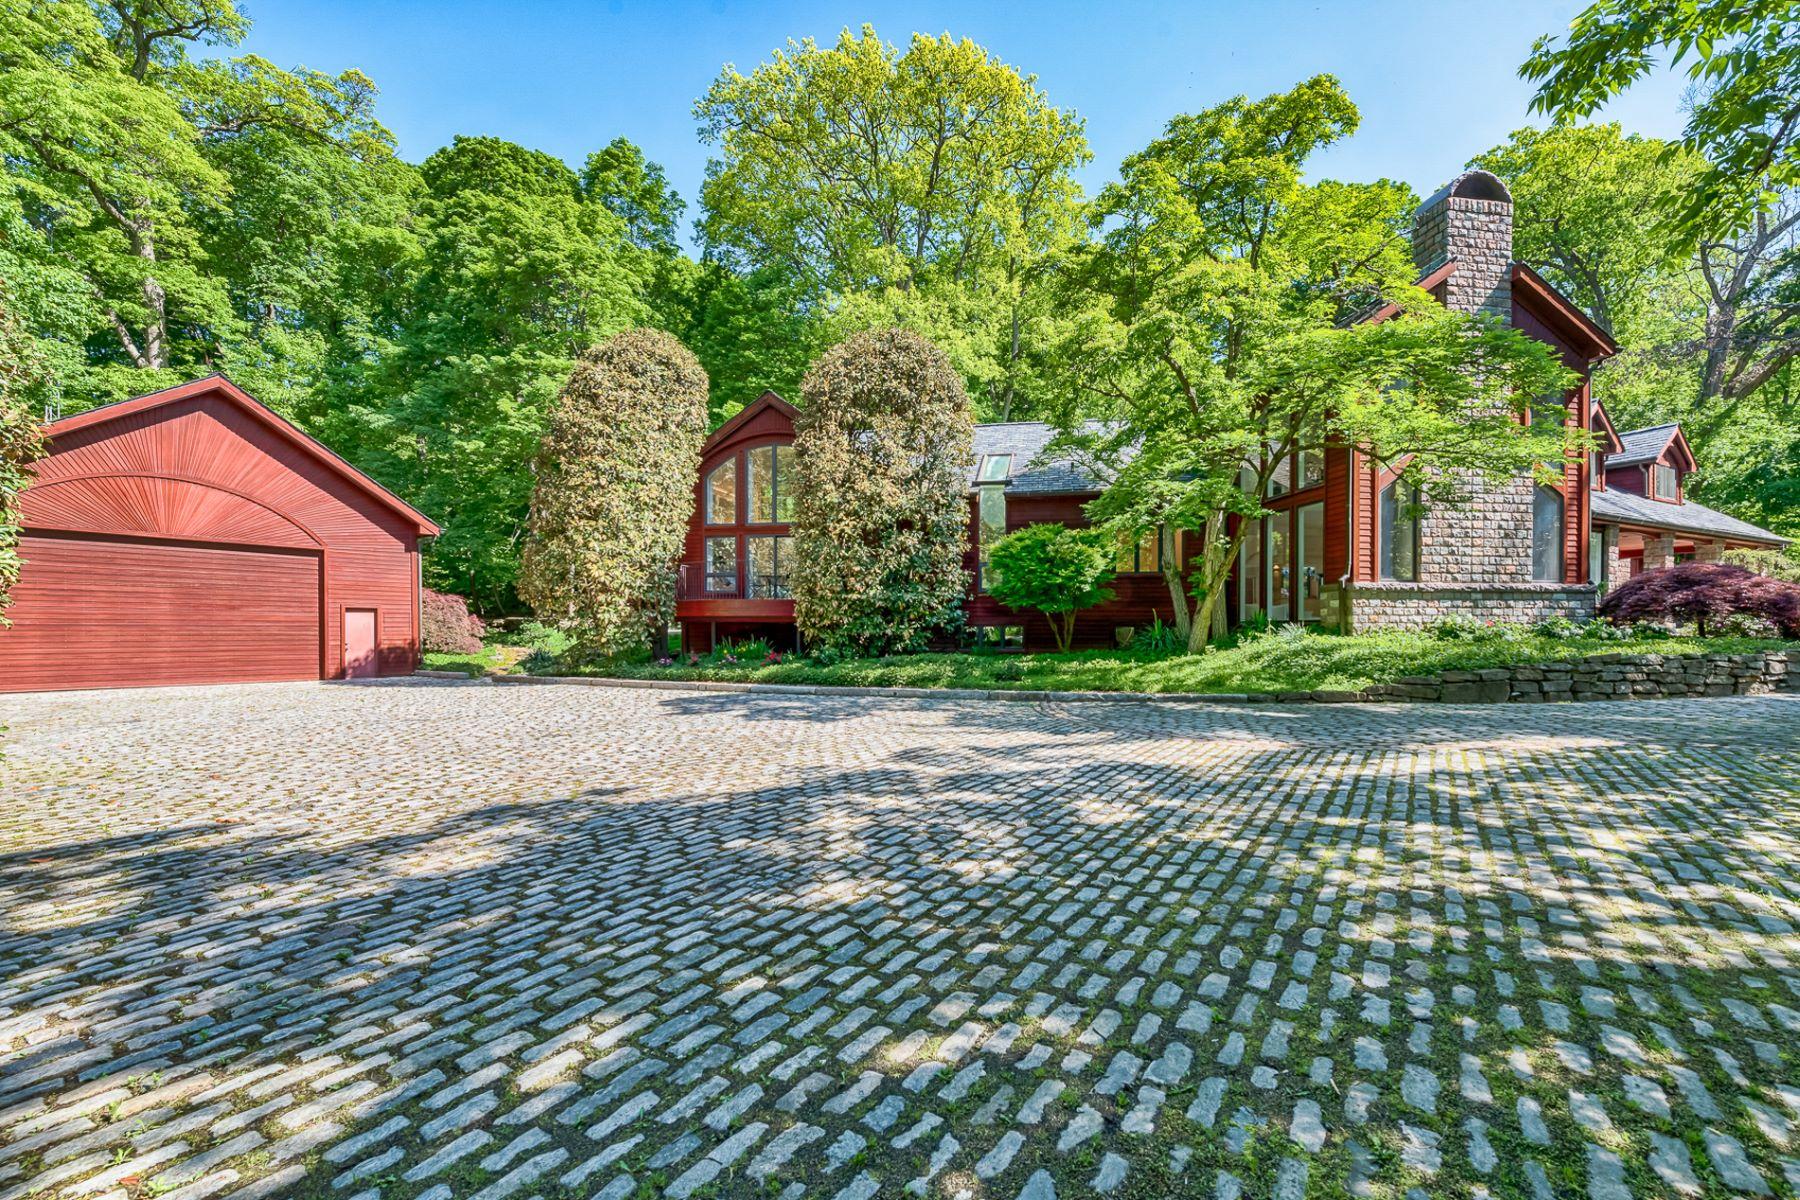 Additional photo for property listing at Arrowhead Estates 9 Arrowhead Estates Ct Chesterfield, Missouri 63017 Estados Unidos